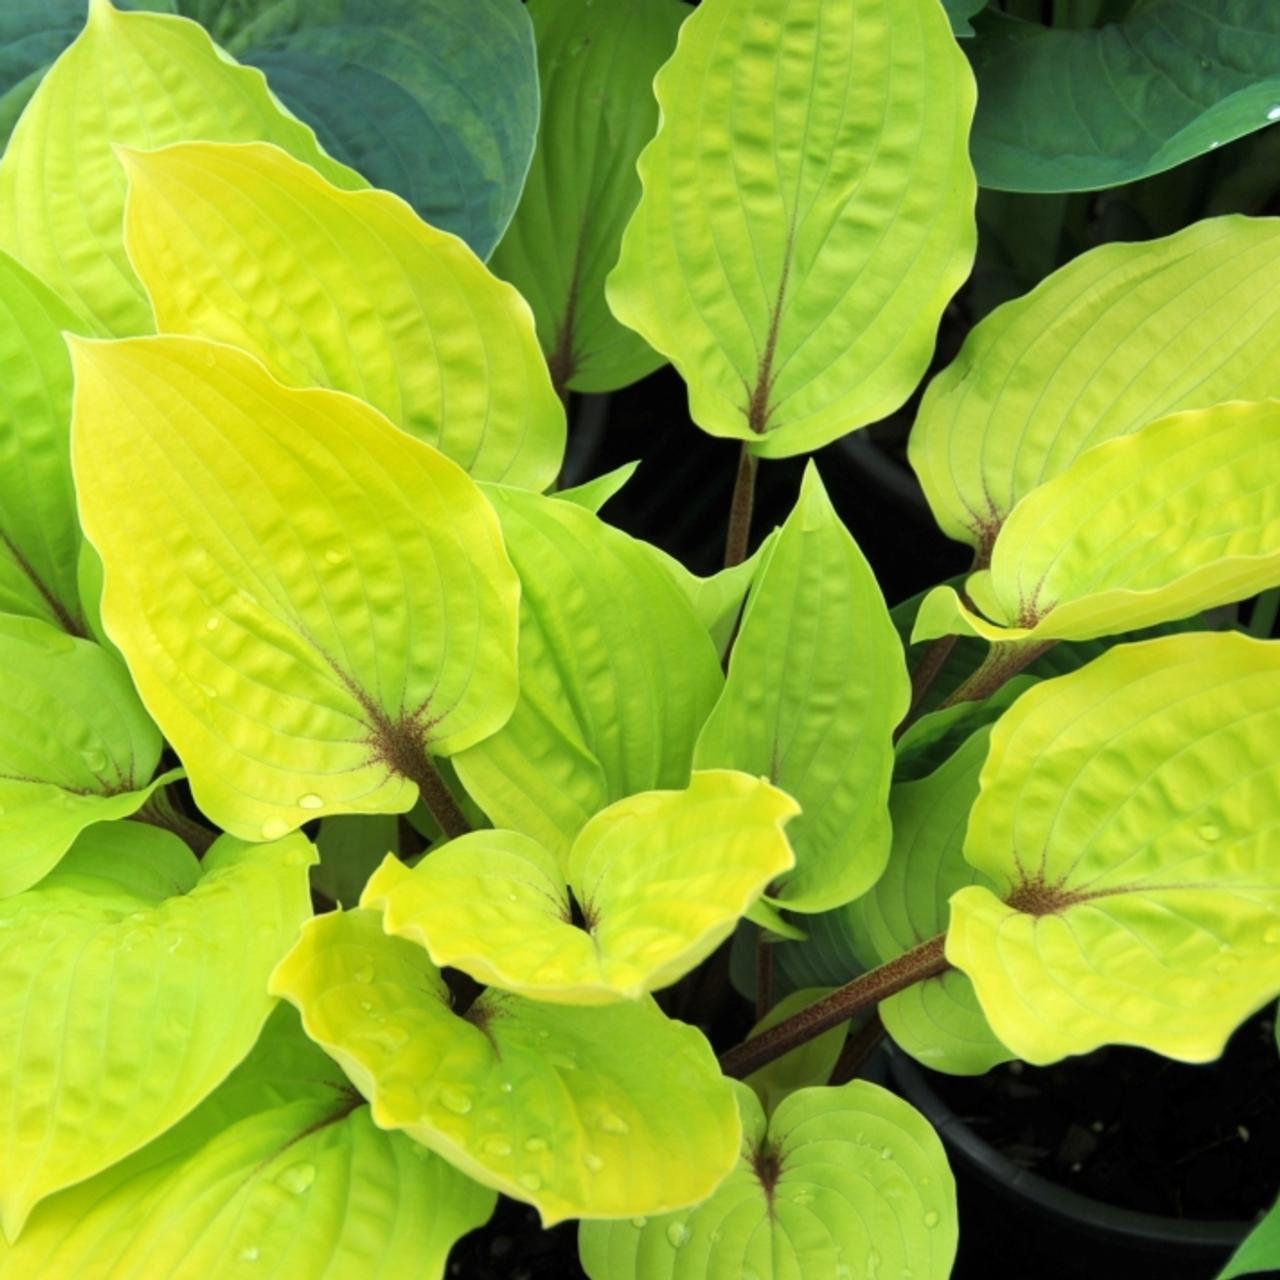 Hosta 'Fire Island' plant